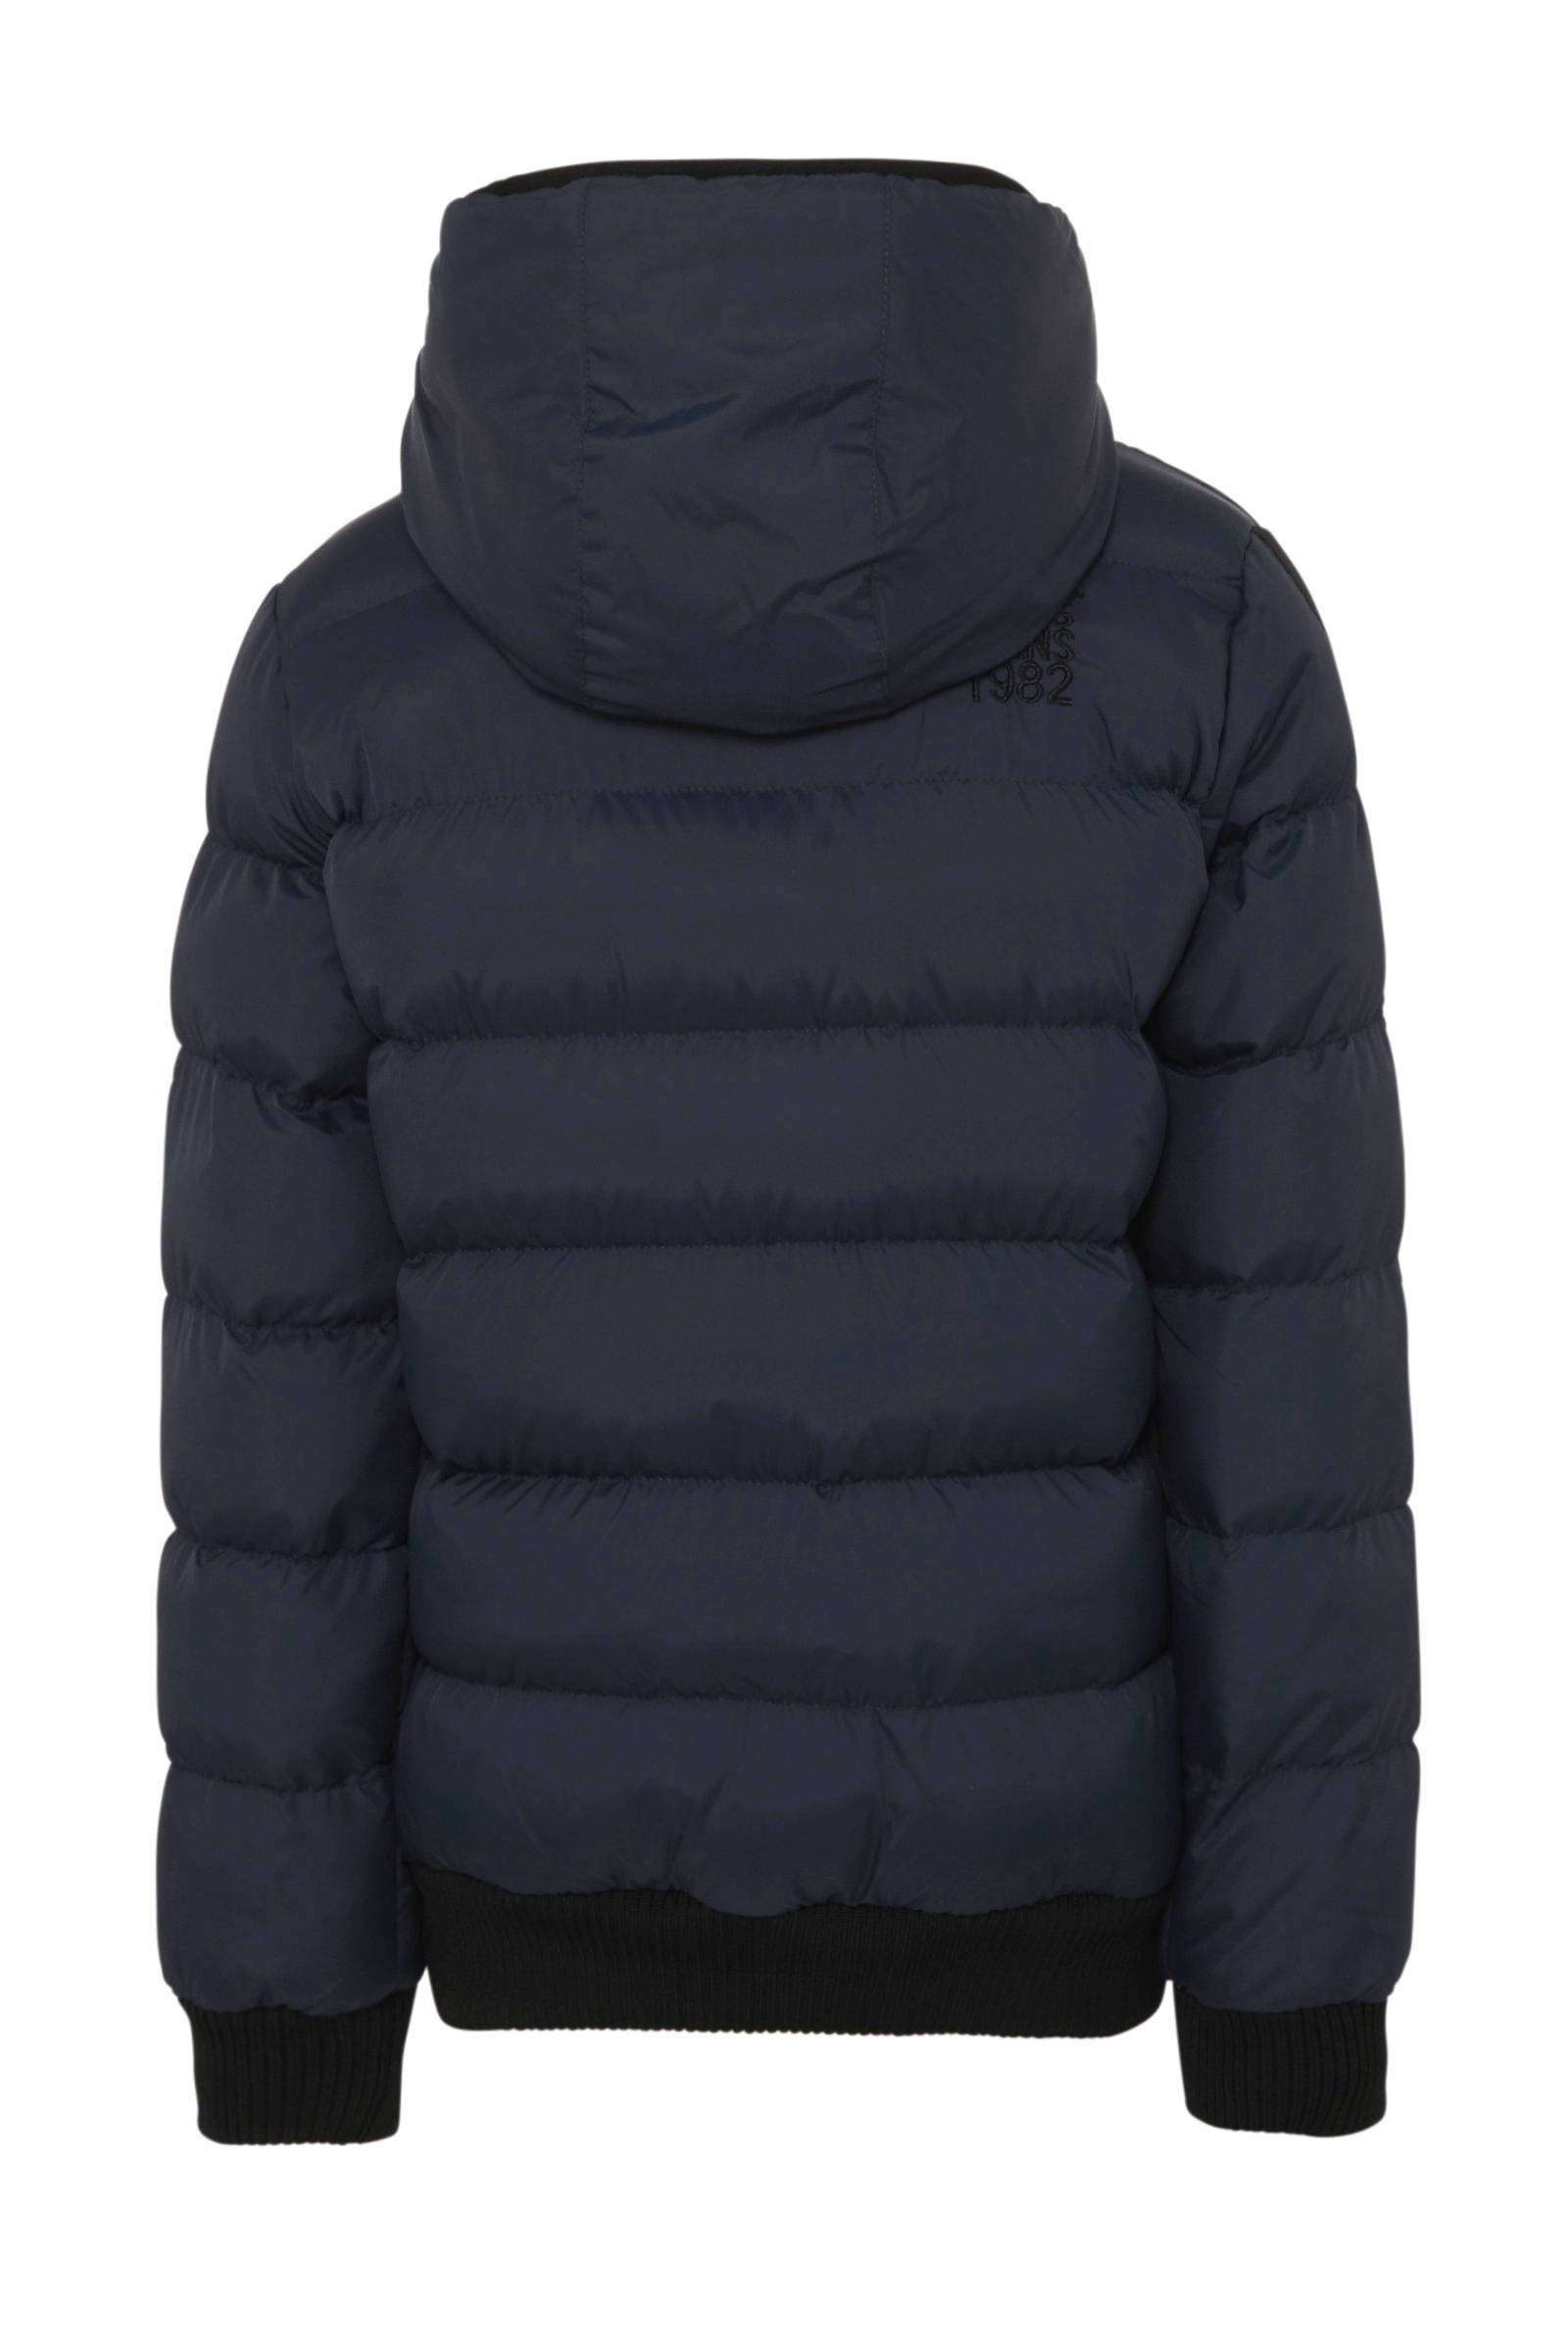 winterjas Drover met contrastbies donkerblauw